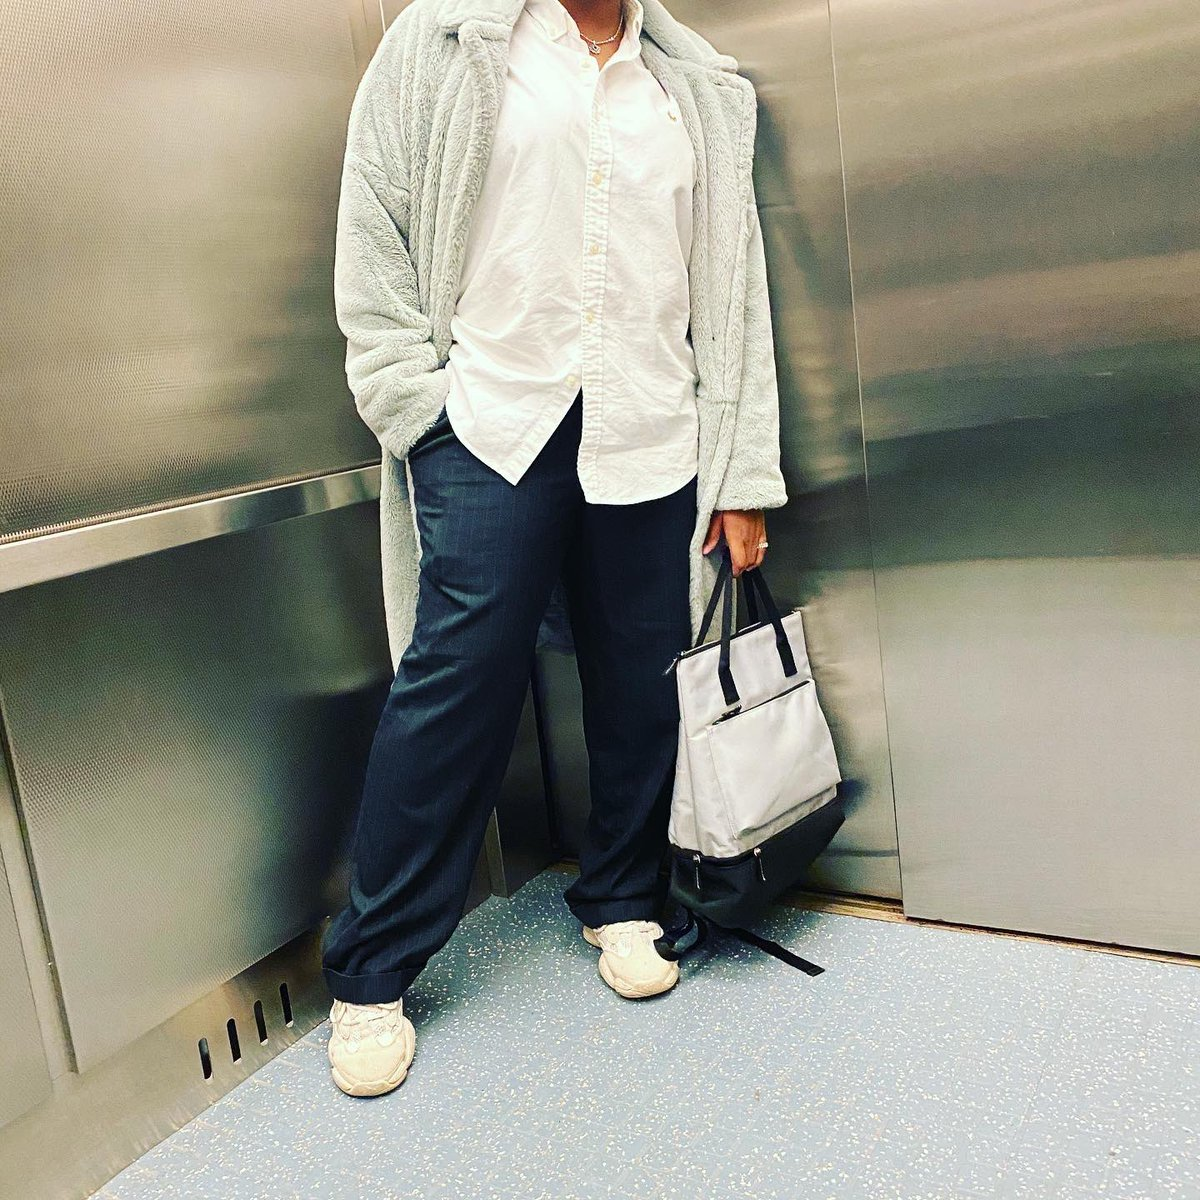 #FASHIONFRIDAYZ  #ad  Coat: @Missguided  Shirt: @RalphLauren  Pants: unknown/thrift  Shoes: @theyeezymafia  Bag: @dsw_us  Sunglasses: @SHEIN_official  #stylist #fashion #fashionblogger #creativedirector #streetwear #streetwearmodel #NYFW #NYC #NYCfashion #model #influencerpic.twitter.com/57kGPyGpjE